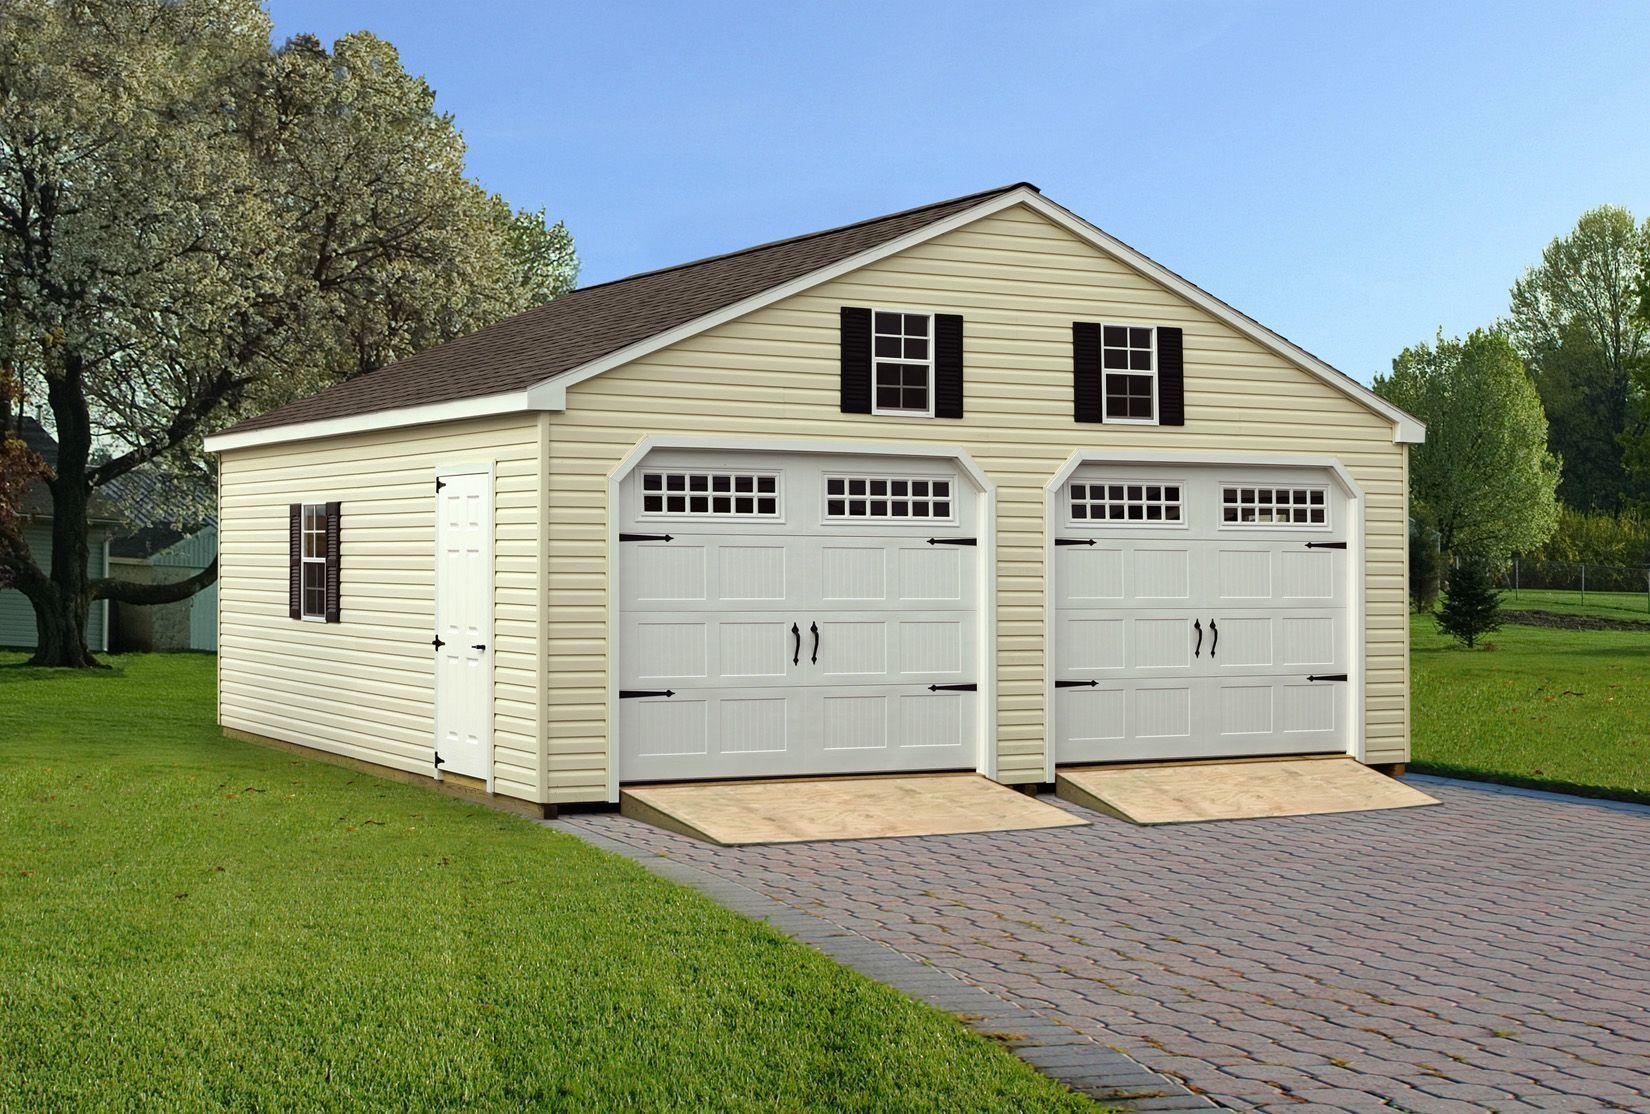 Amishcrafted detached garages 24'x24' doublewide vinyl